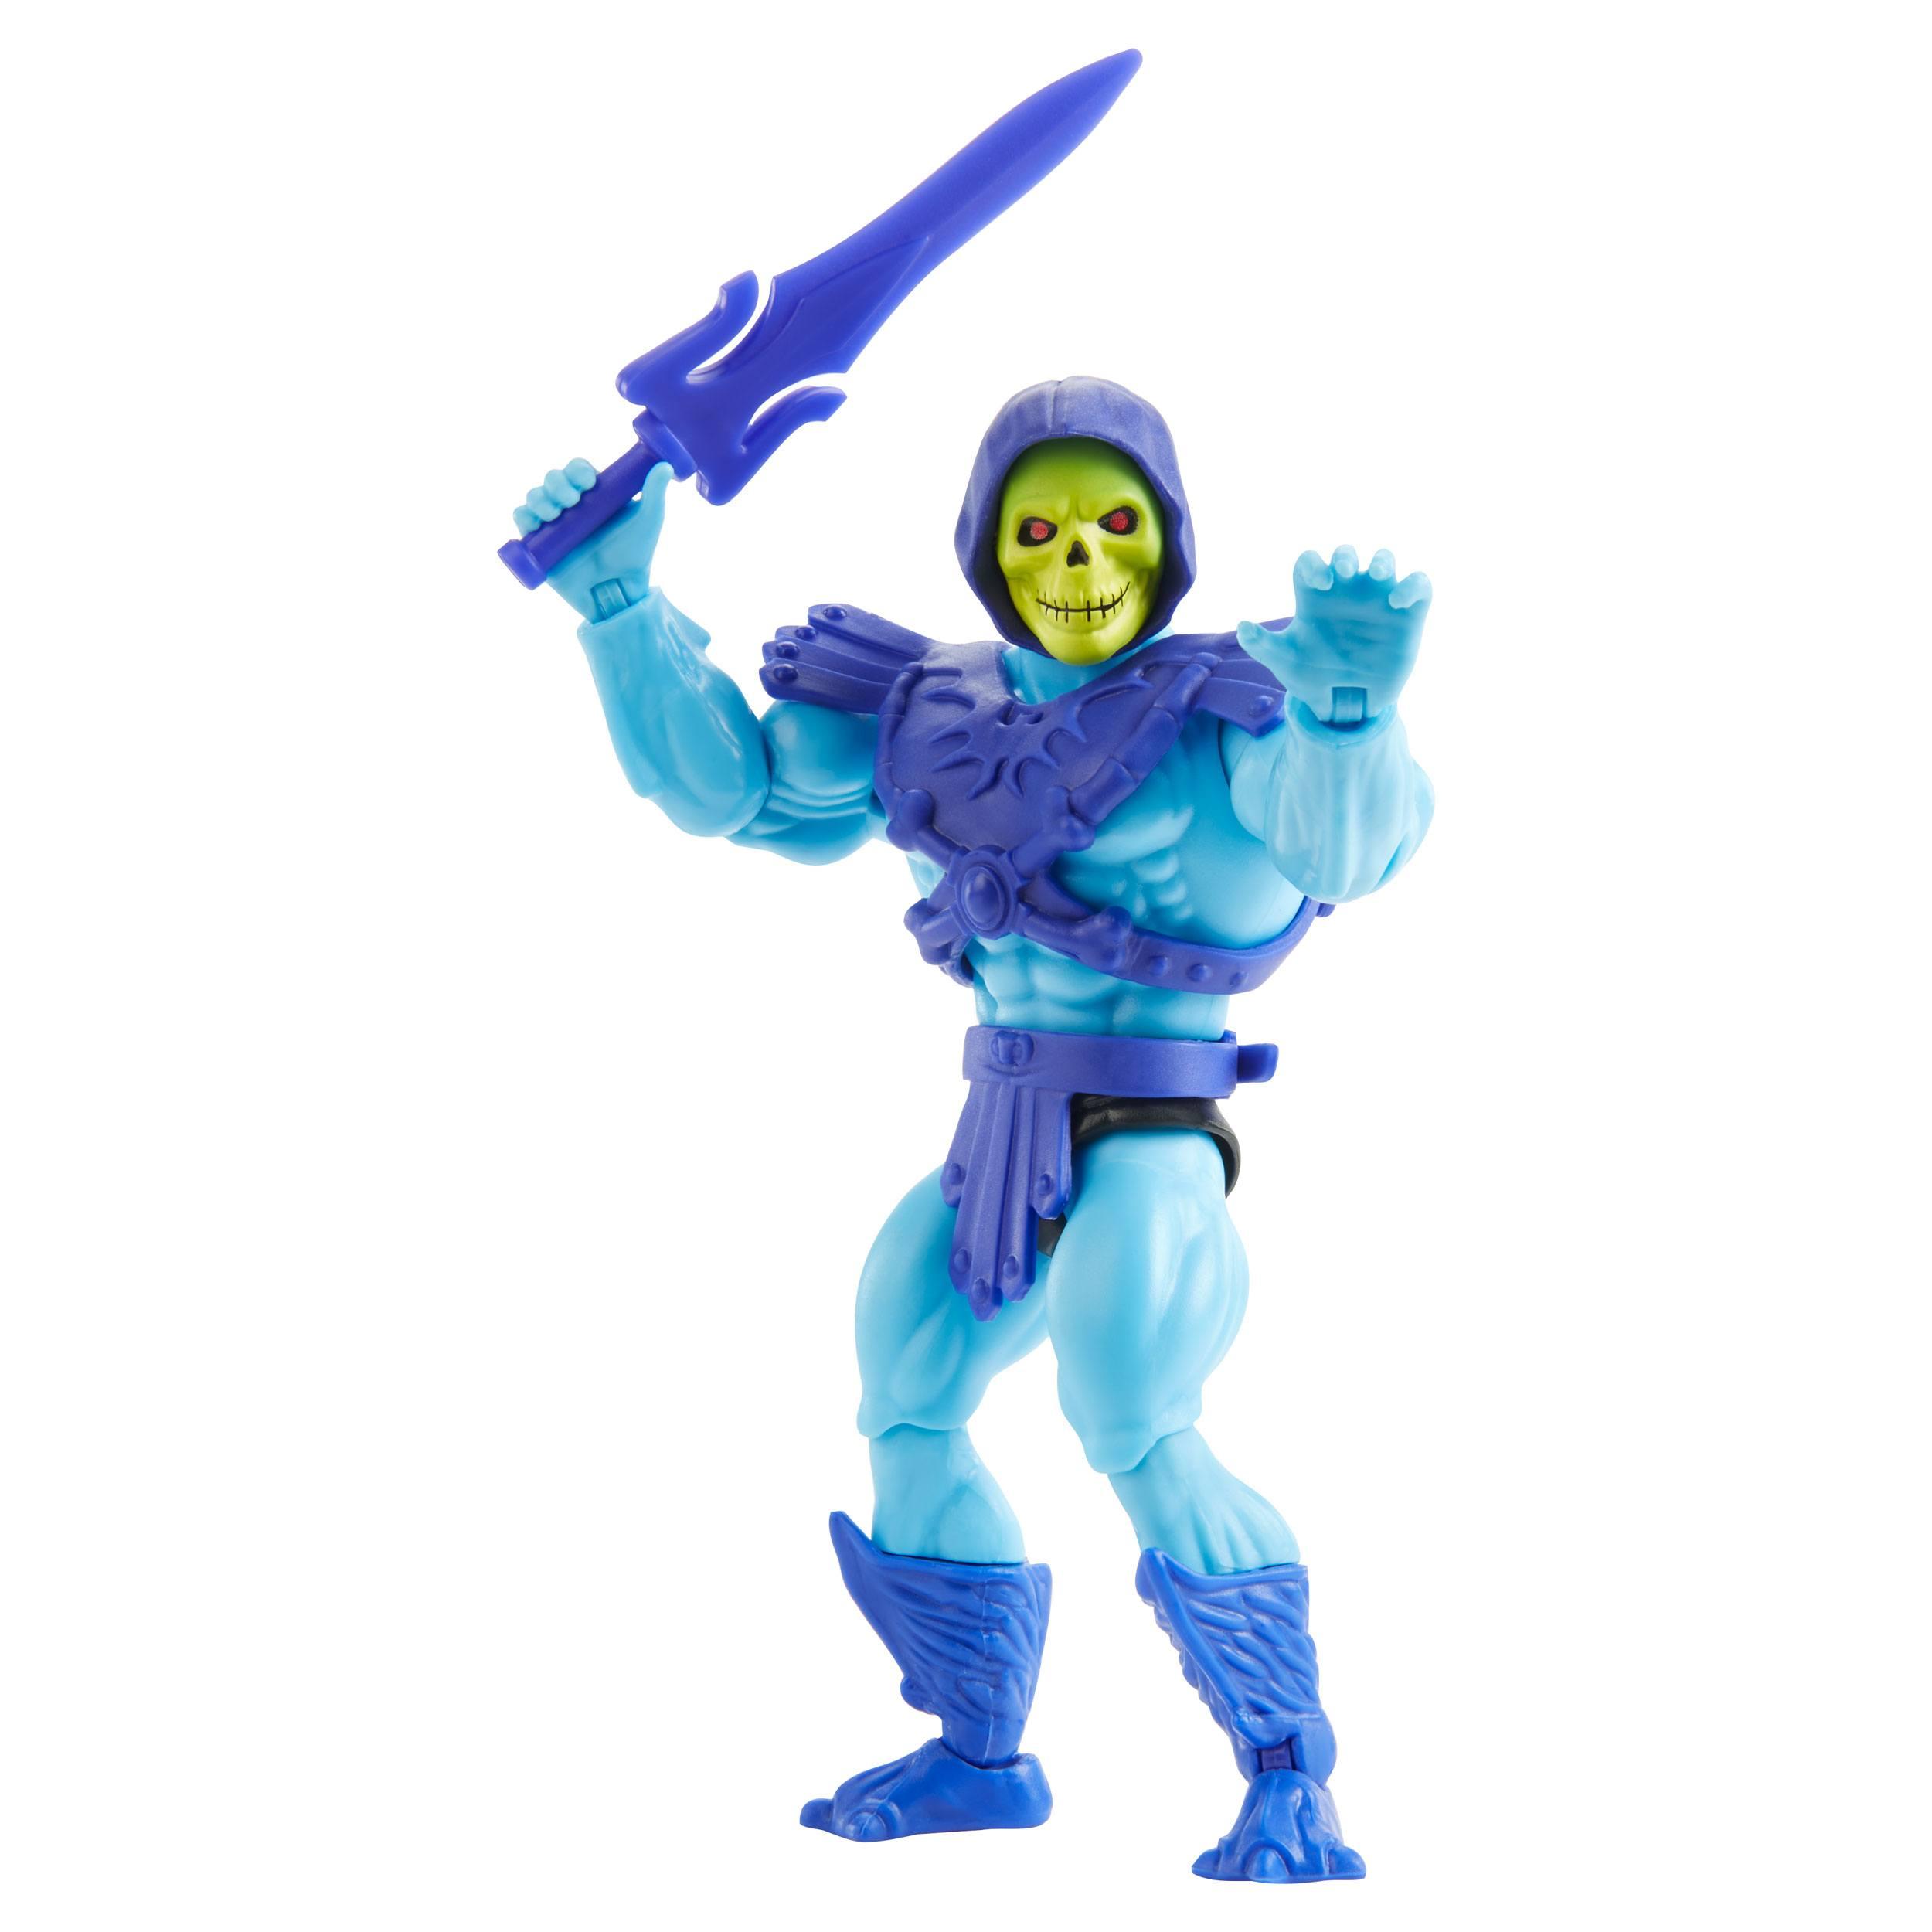 Masters of the Universe Origins Actionfigur 2021 Classic Skeletor 14 cm HGH45 0194735049103